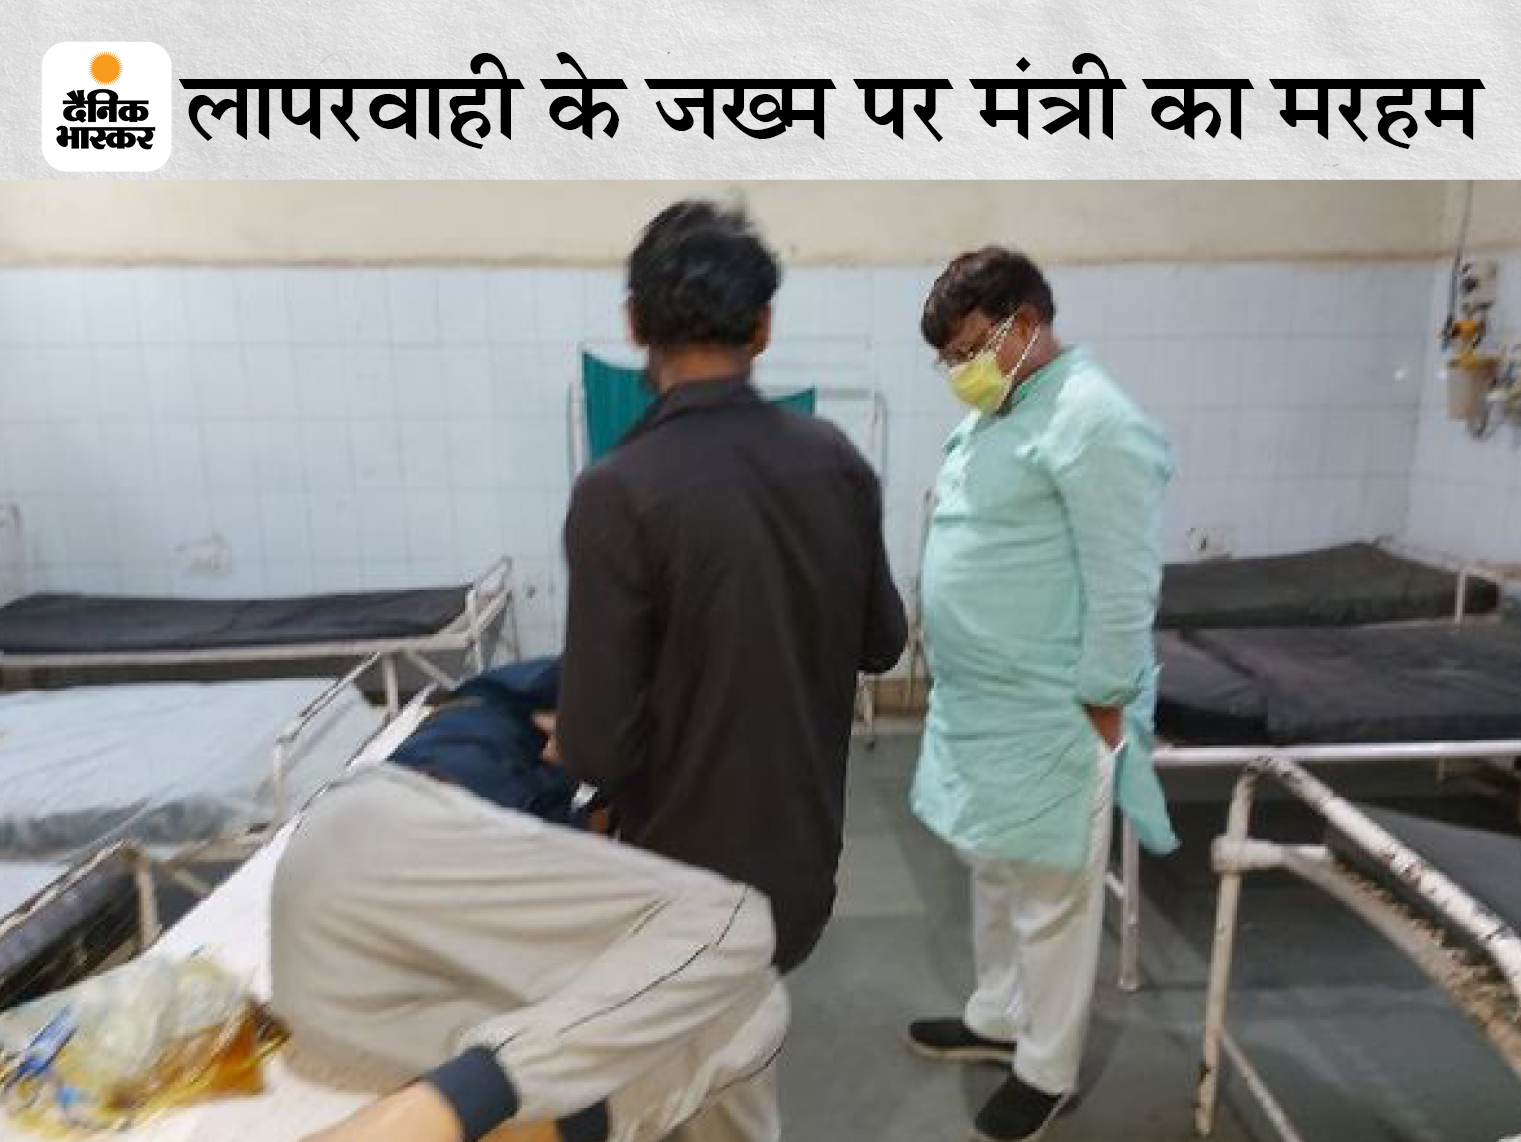 दिल्ली से लौटने के बाद आधी रात को अस्पताल पहुंचे, तड़पता मिला घायल, खड़े होकर करवाया इलाज; कर्फ्यू में घूमते मिले लोग|ग्वालियर,Gwalior - Dainik Bhaskar